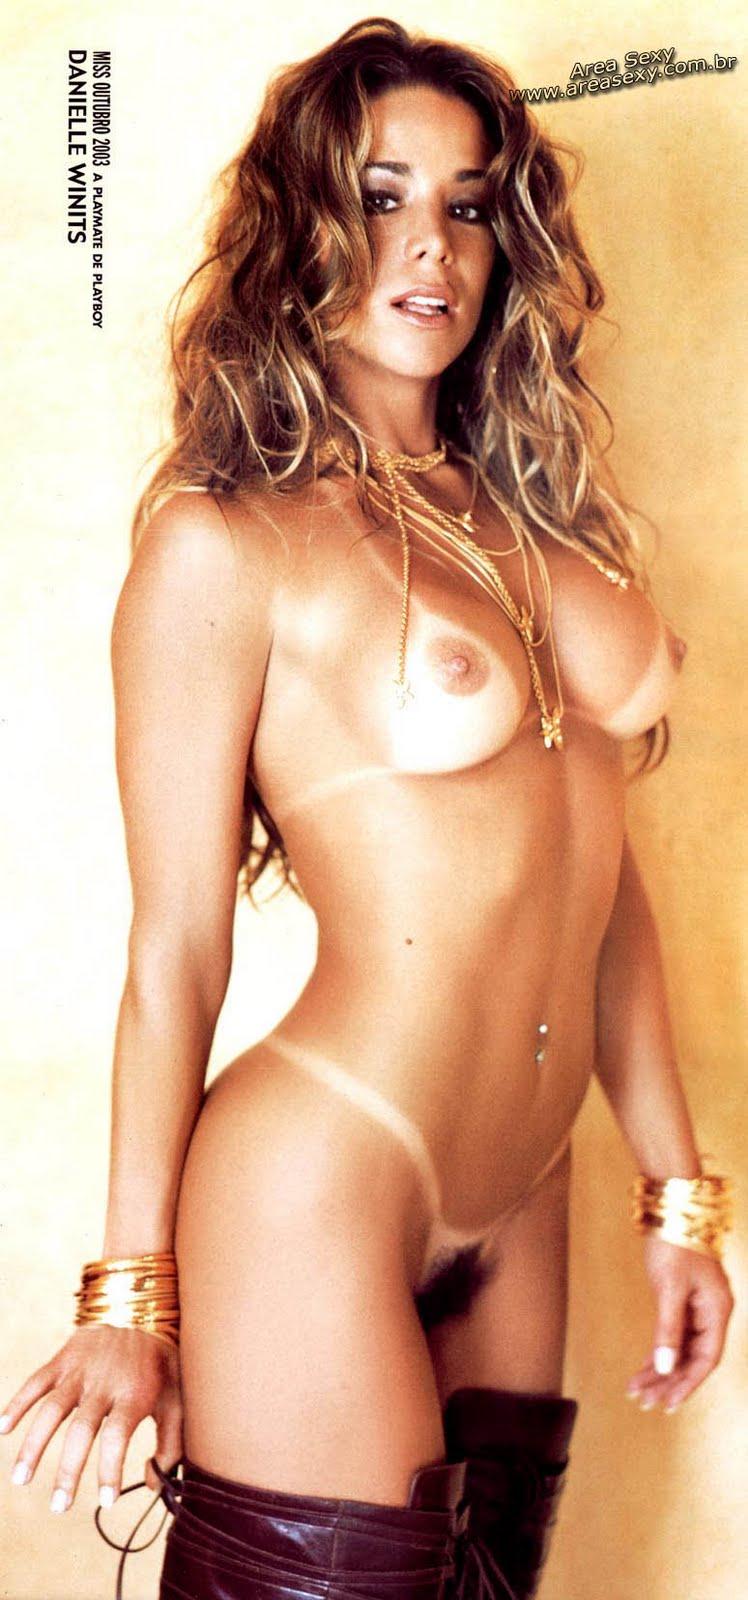 fotografii-golih-brazilskih-znamenitostey